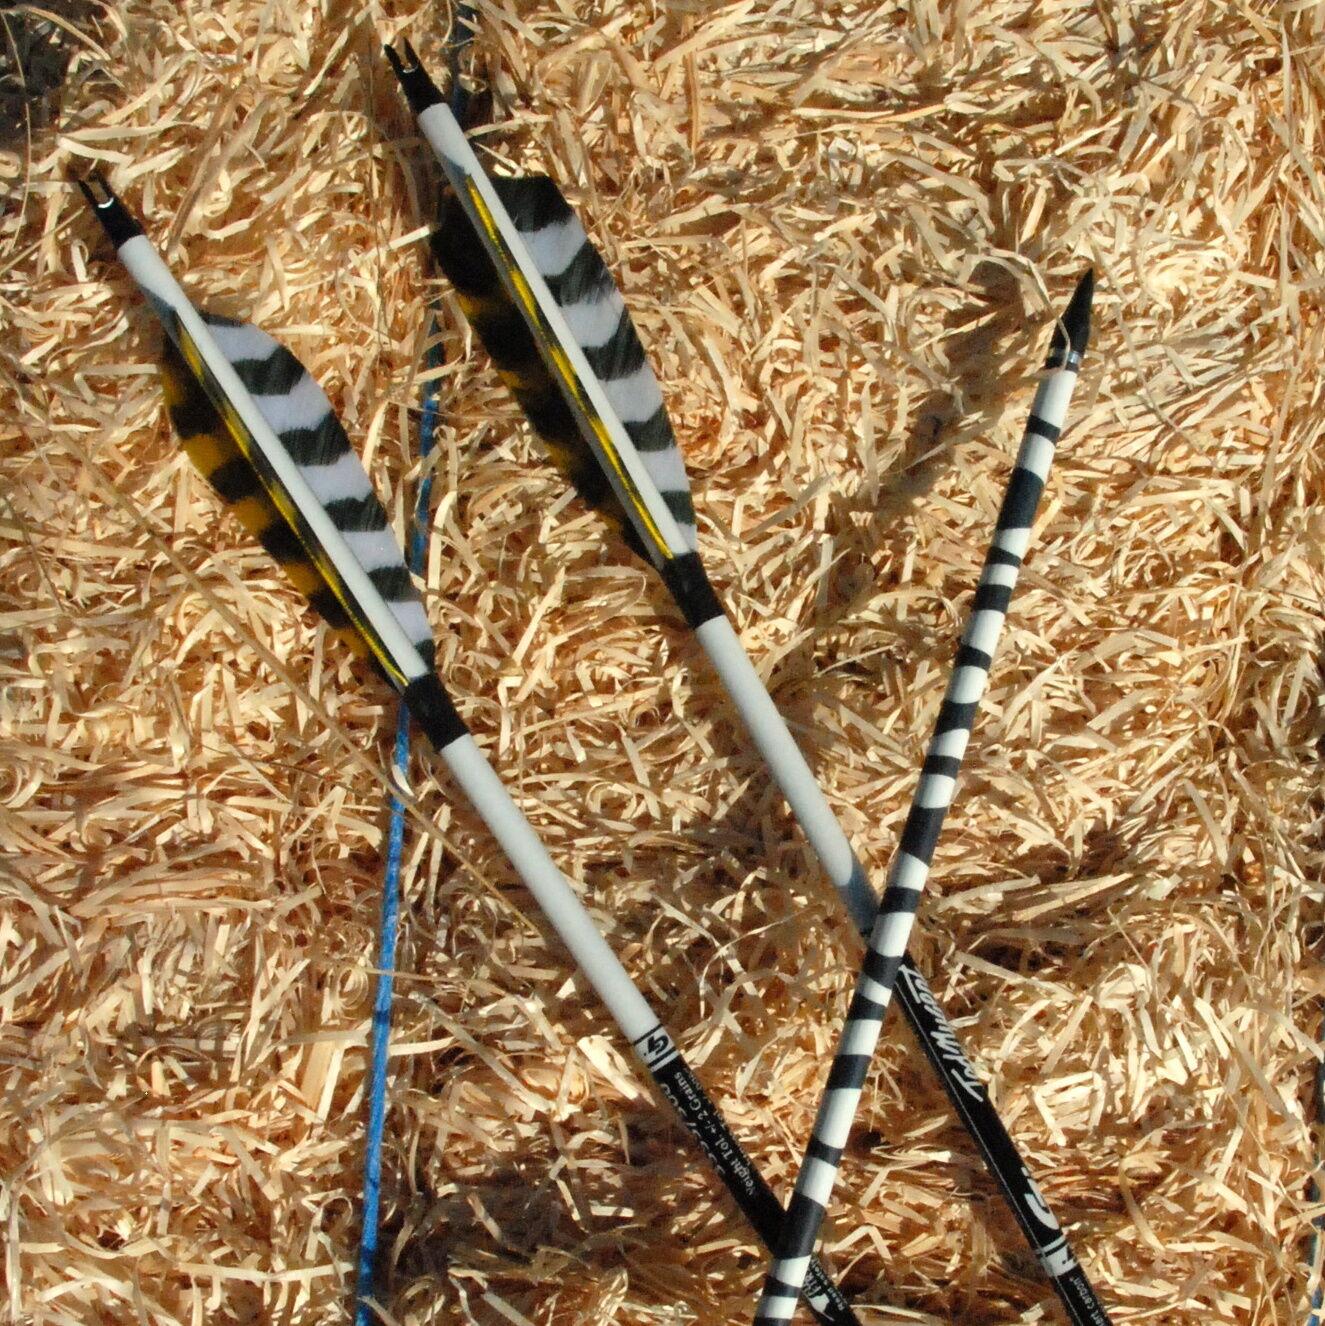 6 Carbonpfeile Ted Nugent Nugent Nugent Zebra ac2f0e